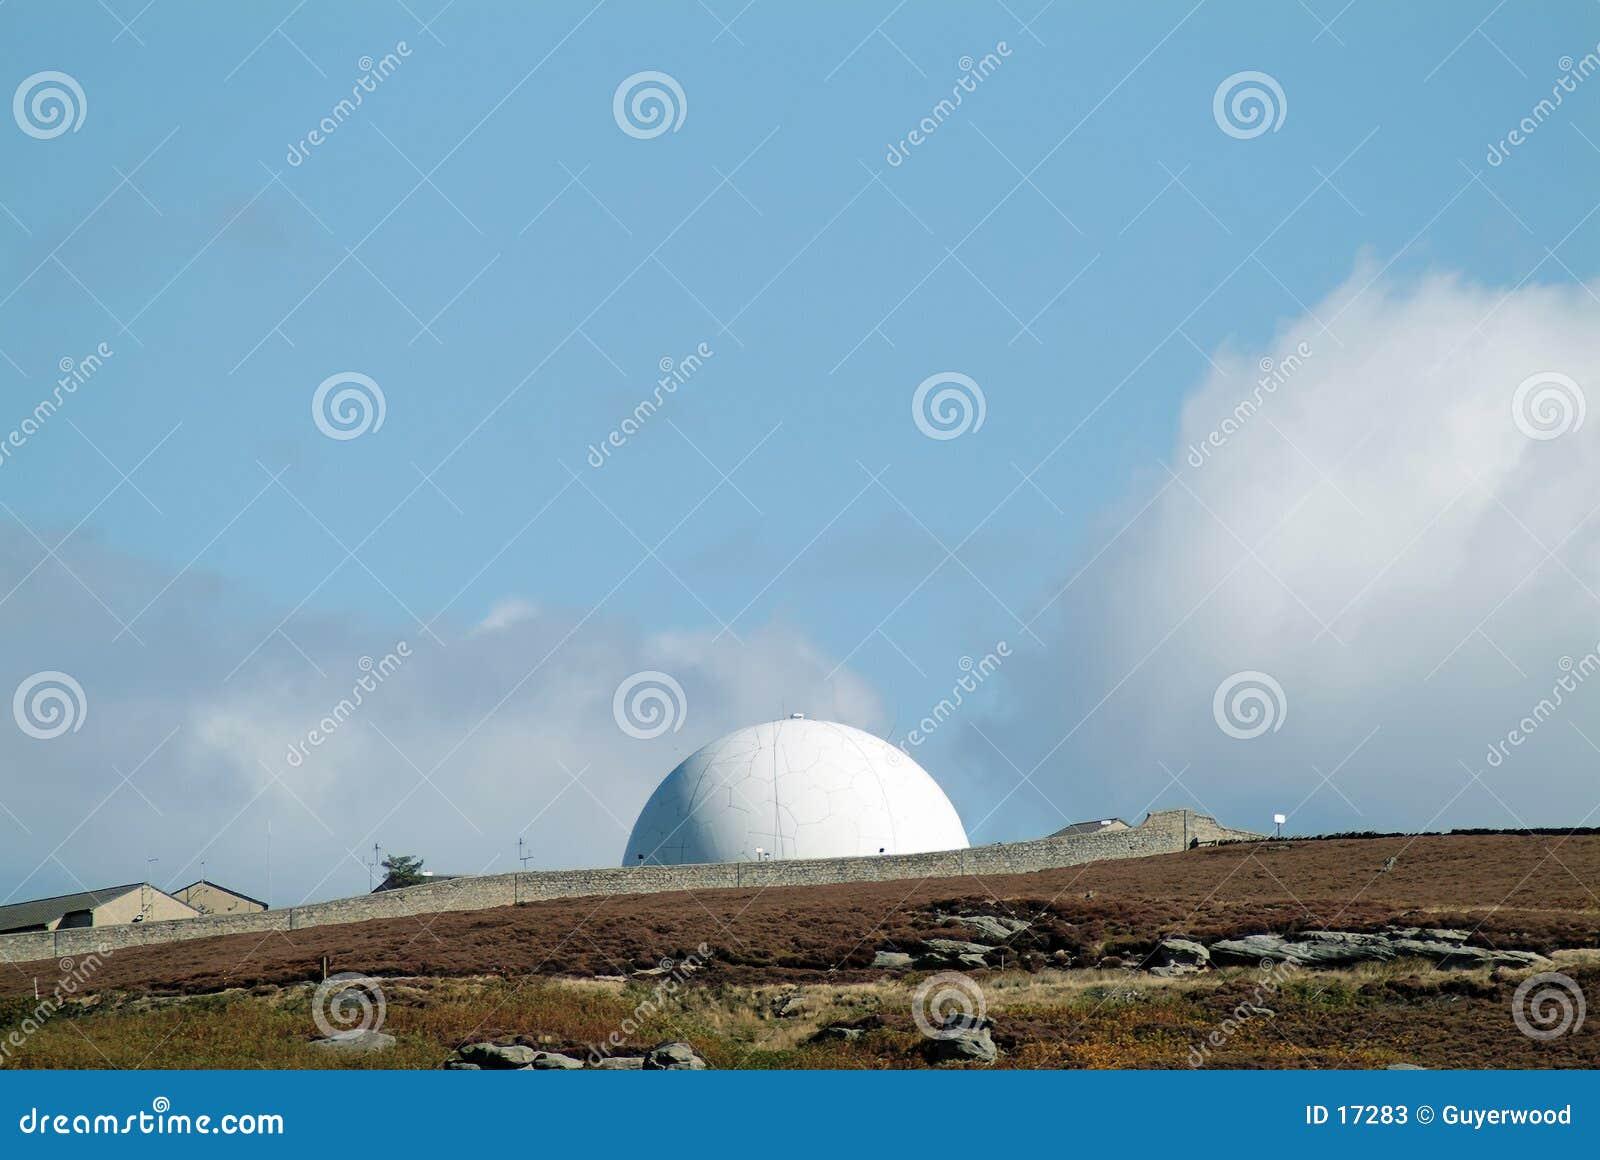 Bóveda de radar